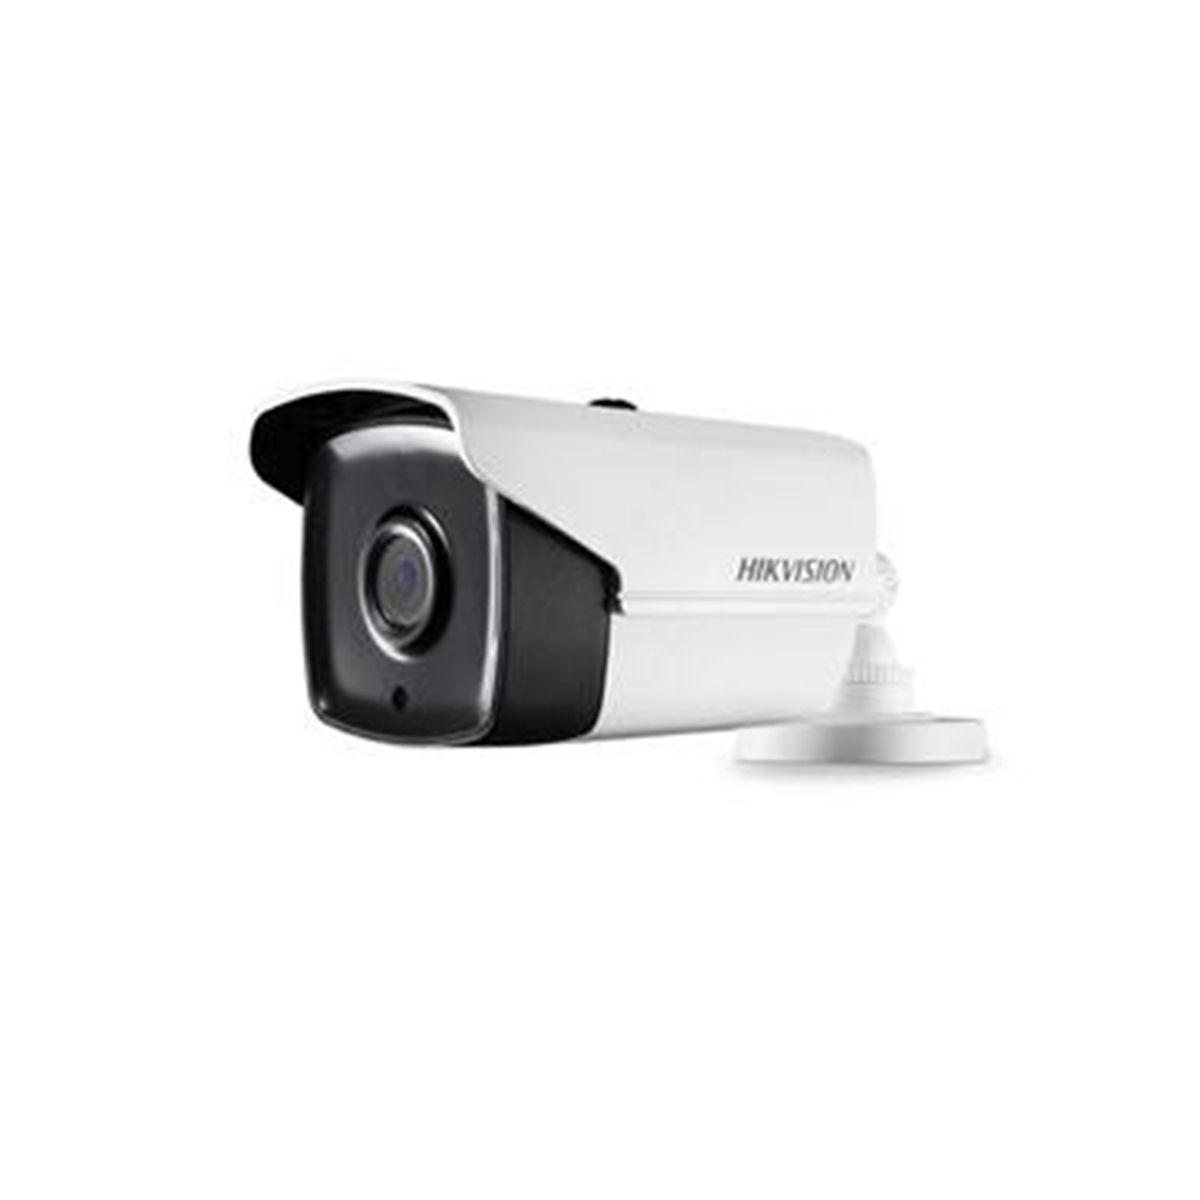 Cámara Hikvision Turbo HD Tipo Bullet DS-2CE16F1T-IT3